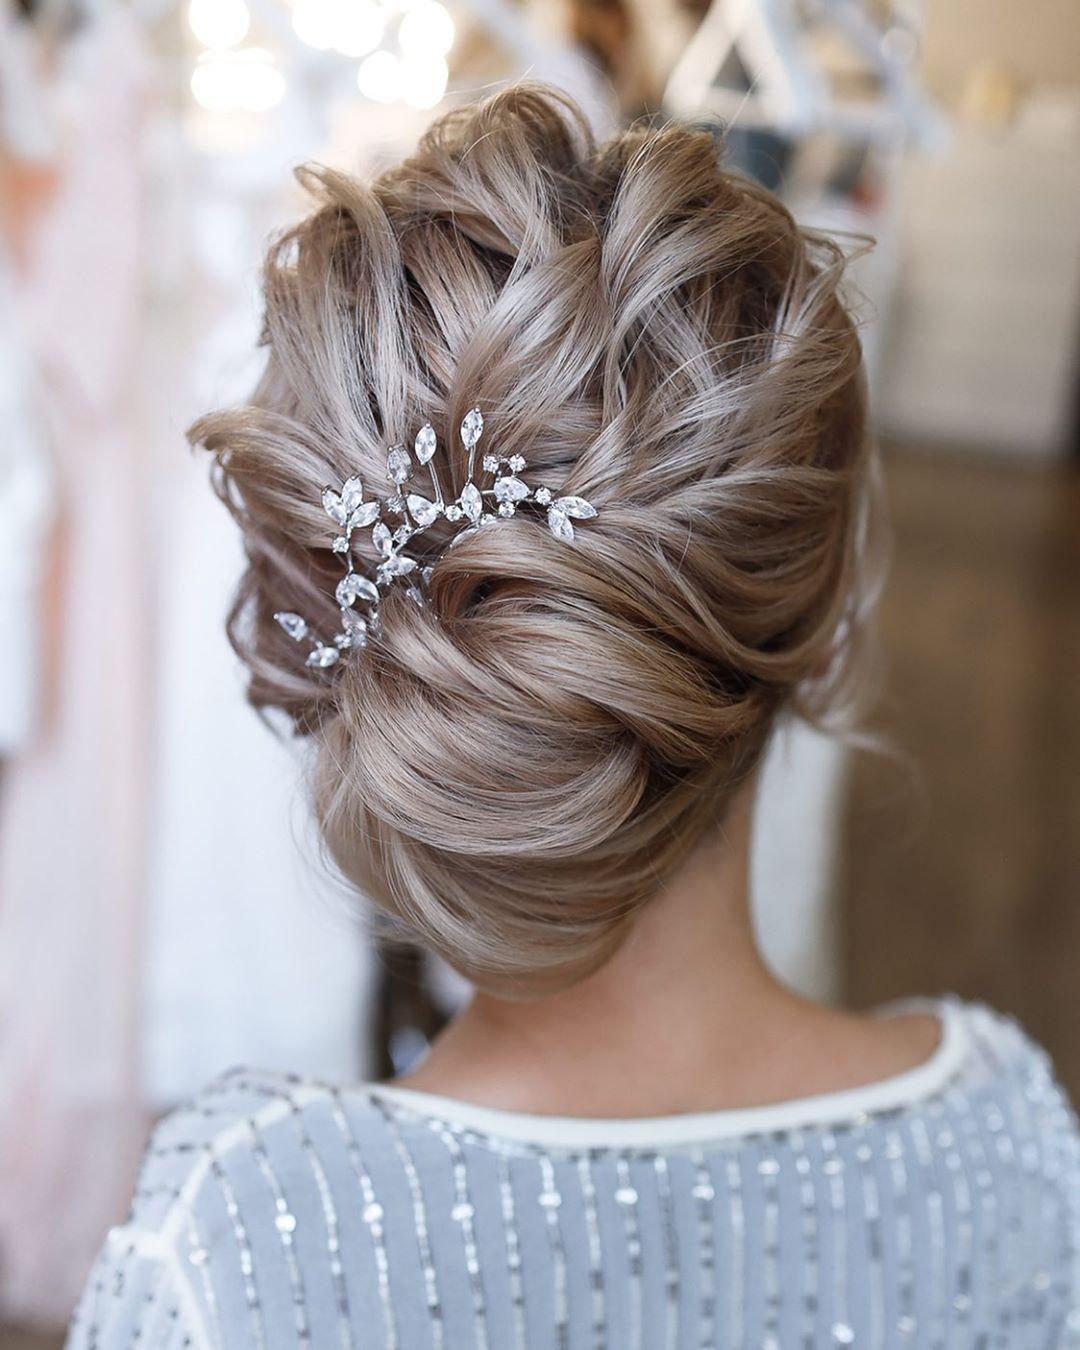 lob hair| prom hairstyles| cute hairstyles| hair scrunchie| winterformal  hairst… в 2020 г | Прически из распущенных волос, Убранные длинные волосы,  Прически для тонких волос